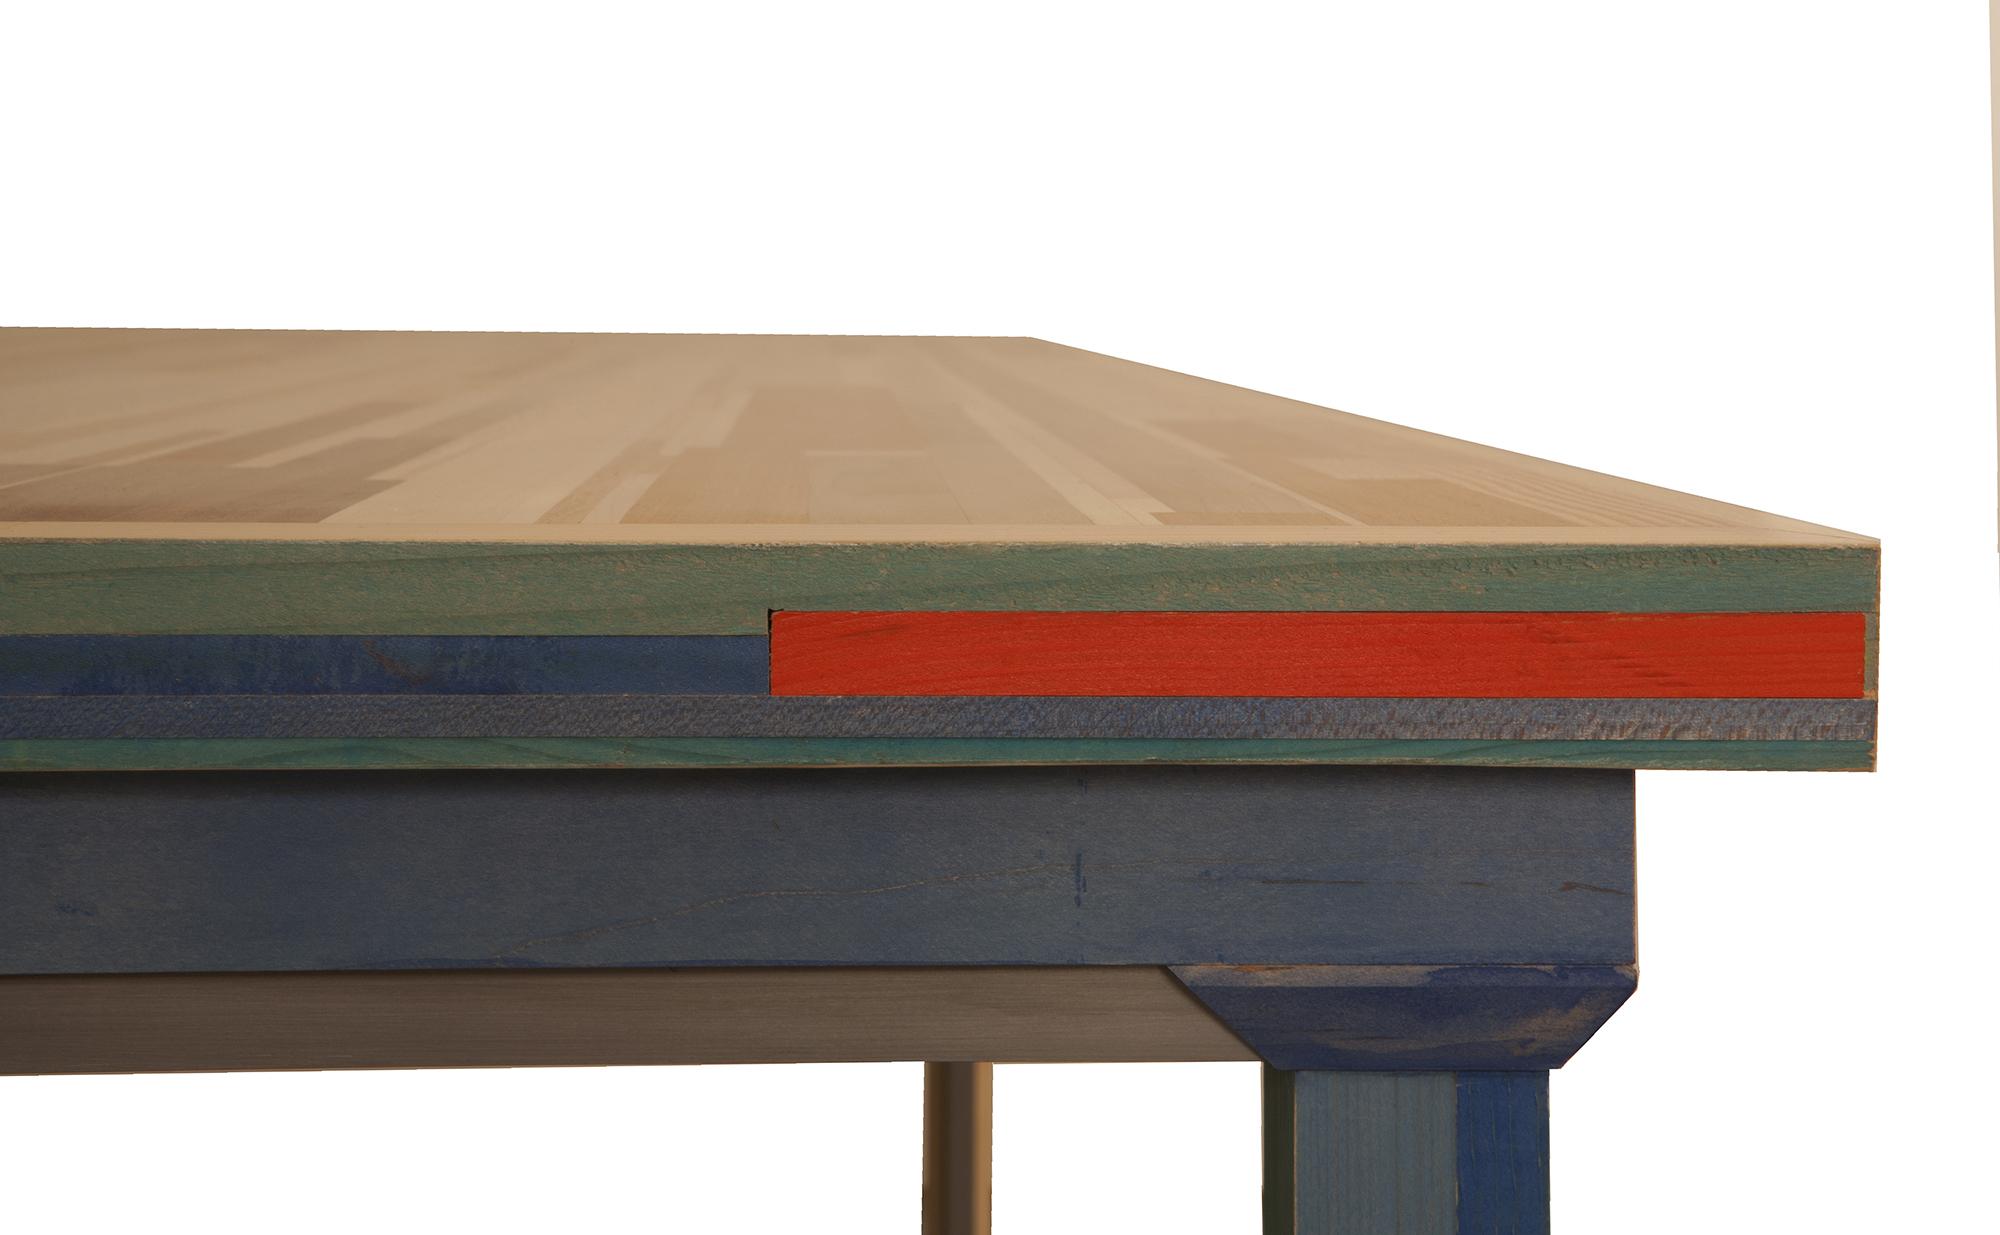 TABLE_SIDE_DETAIL3.jpg